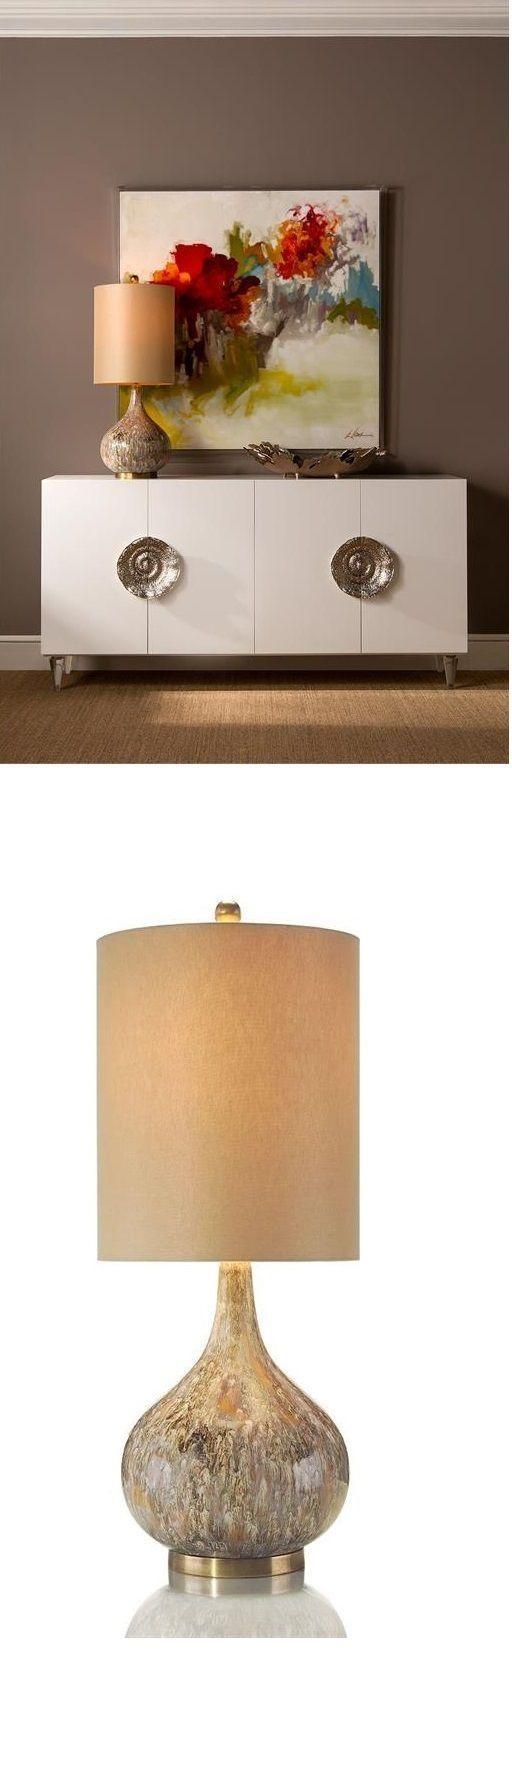 Living Room Lamps Walmart Lamps Living Room Luxury Lamps Table Lamp Luxury